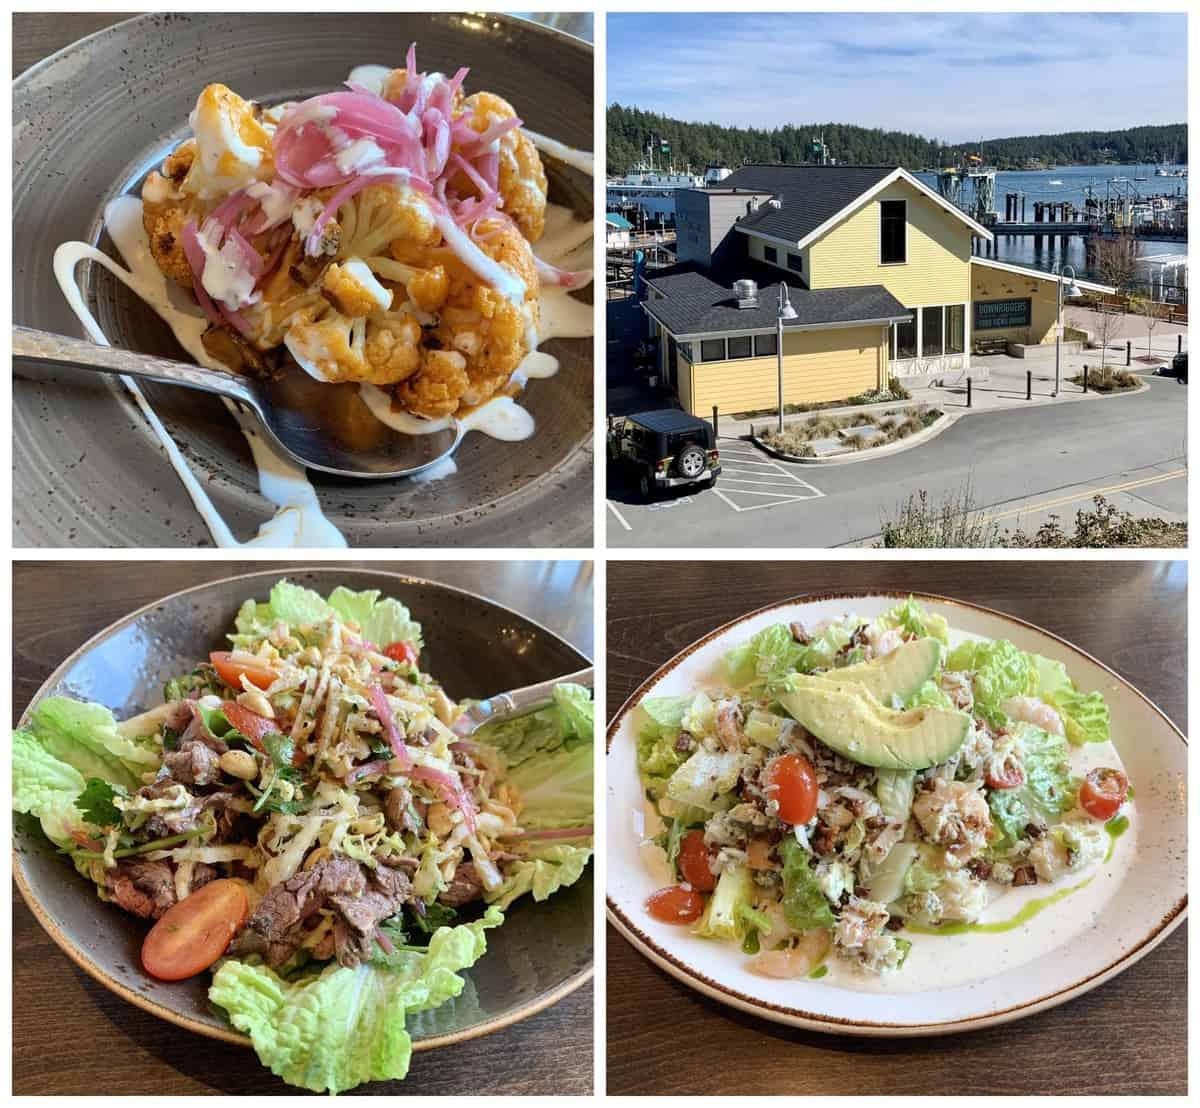 Plates of Keto-friendly food at Downriggers on San Juan Island